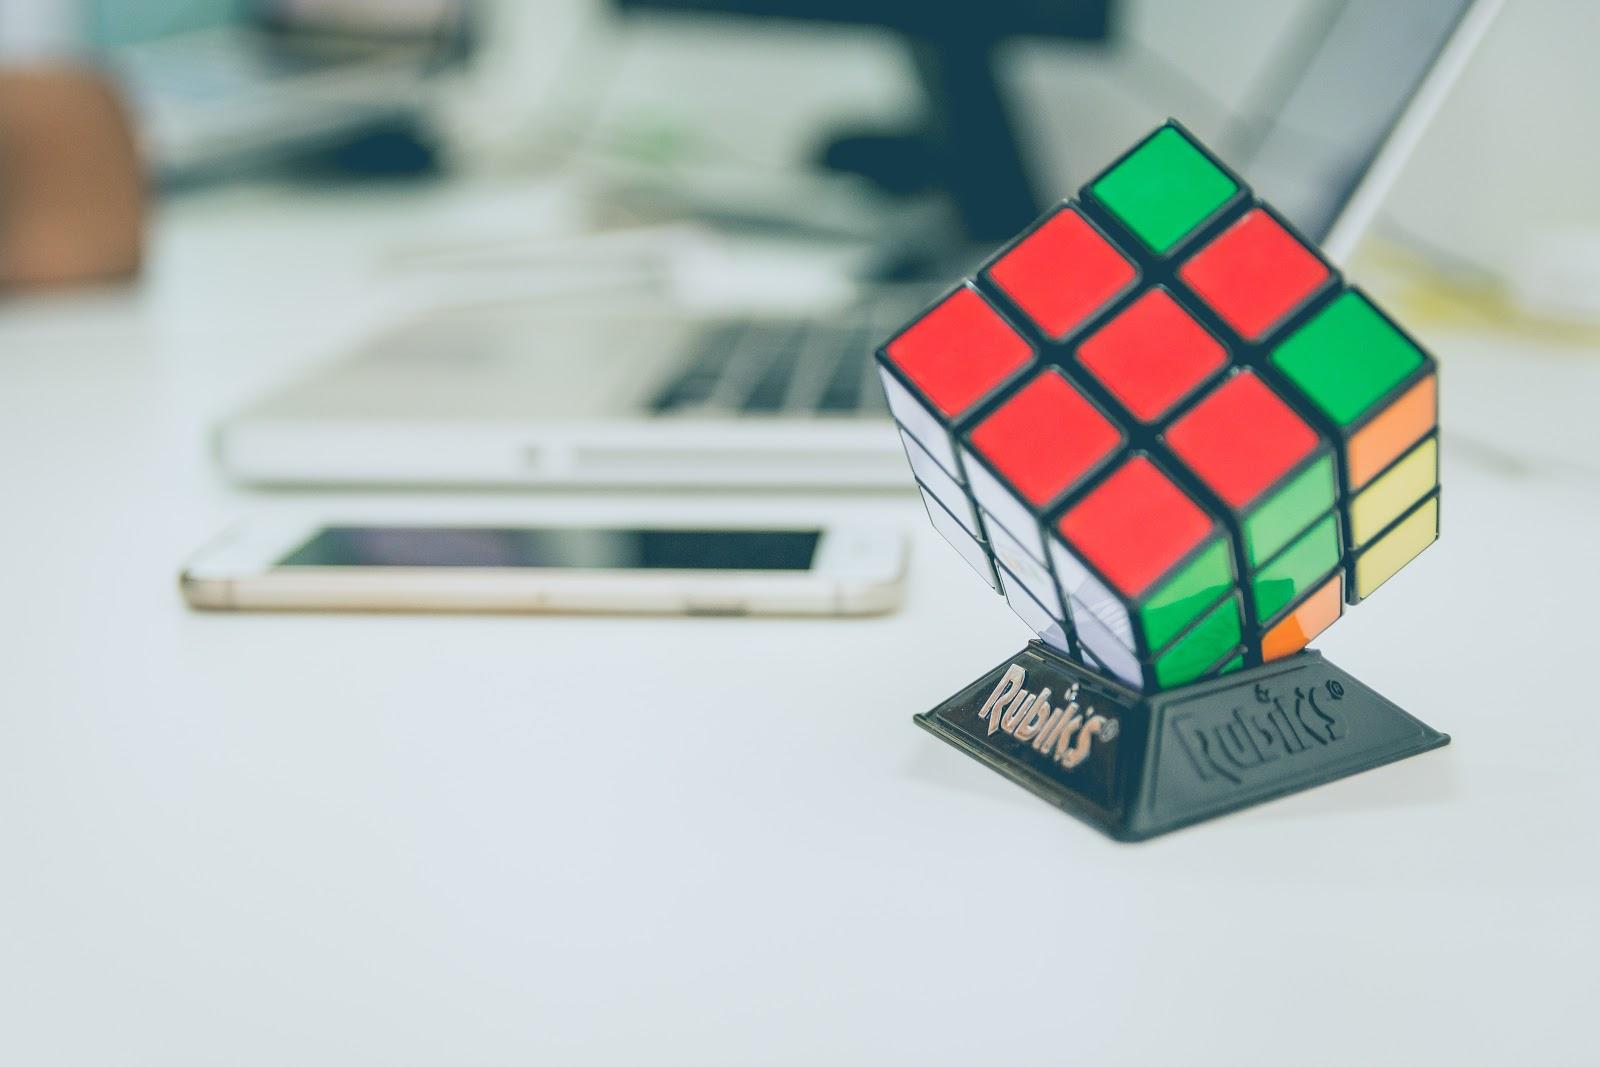 Rubik's Cube near the laptop